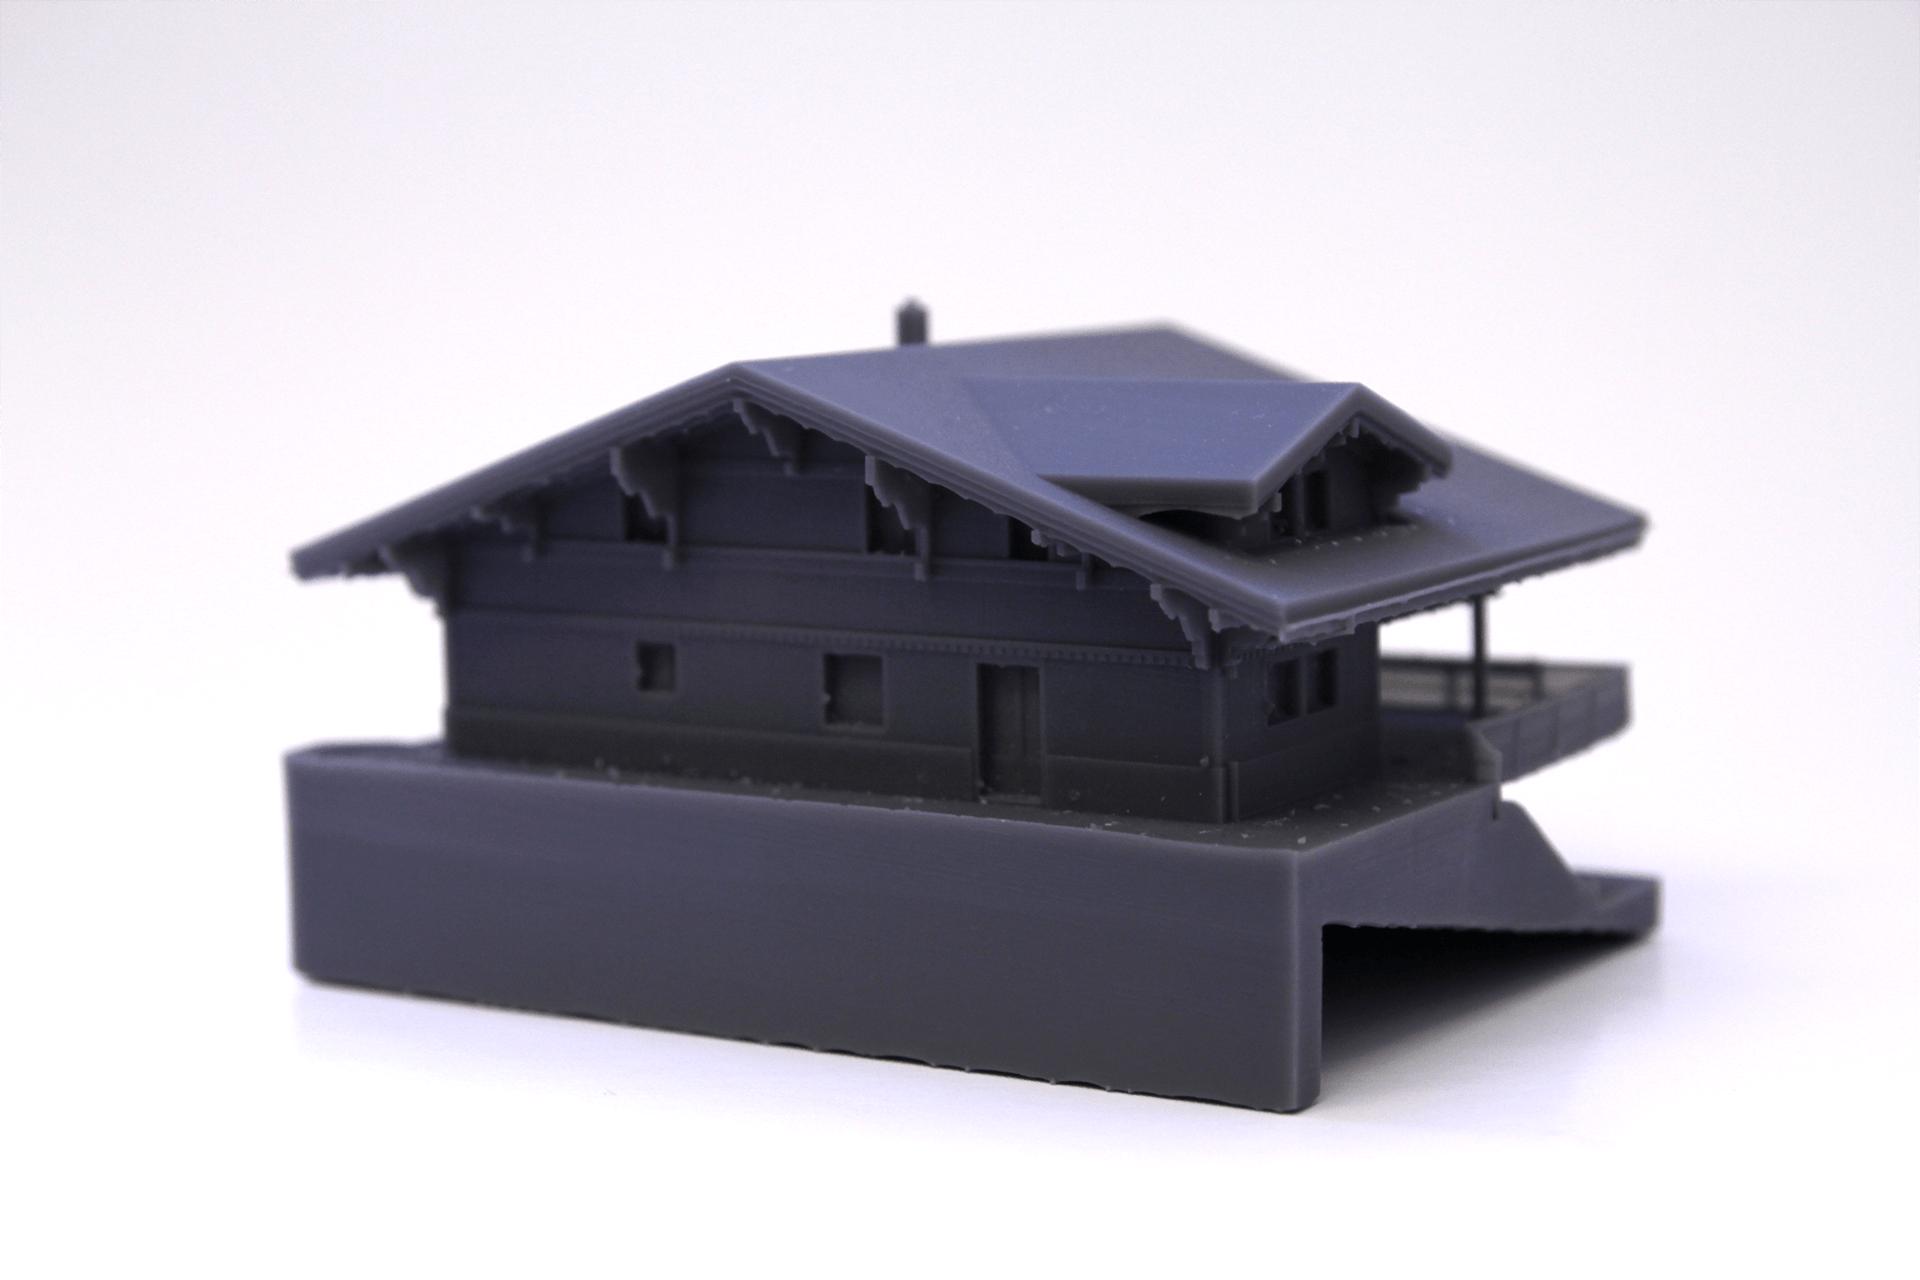 https://fsw-kreatektur.ch/wp-content/uploads/Fsw-Kreatektur-Architektur-3D-Chalet.png